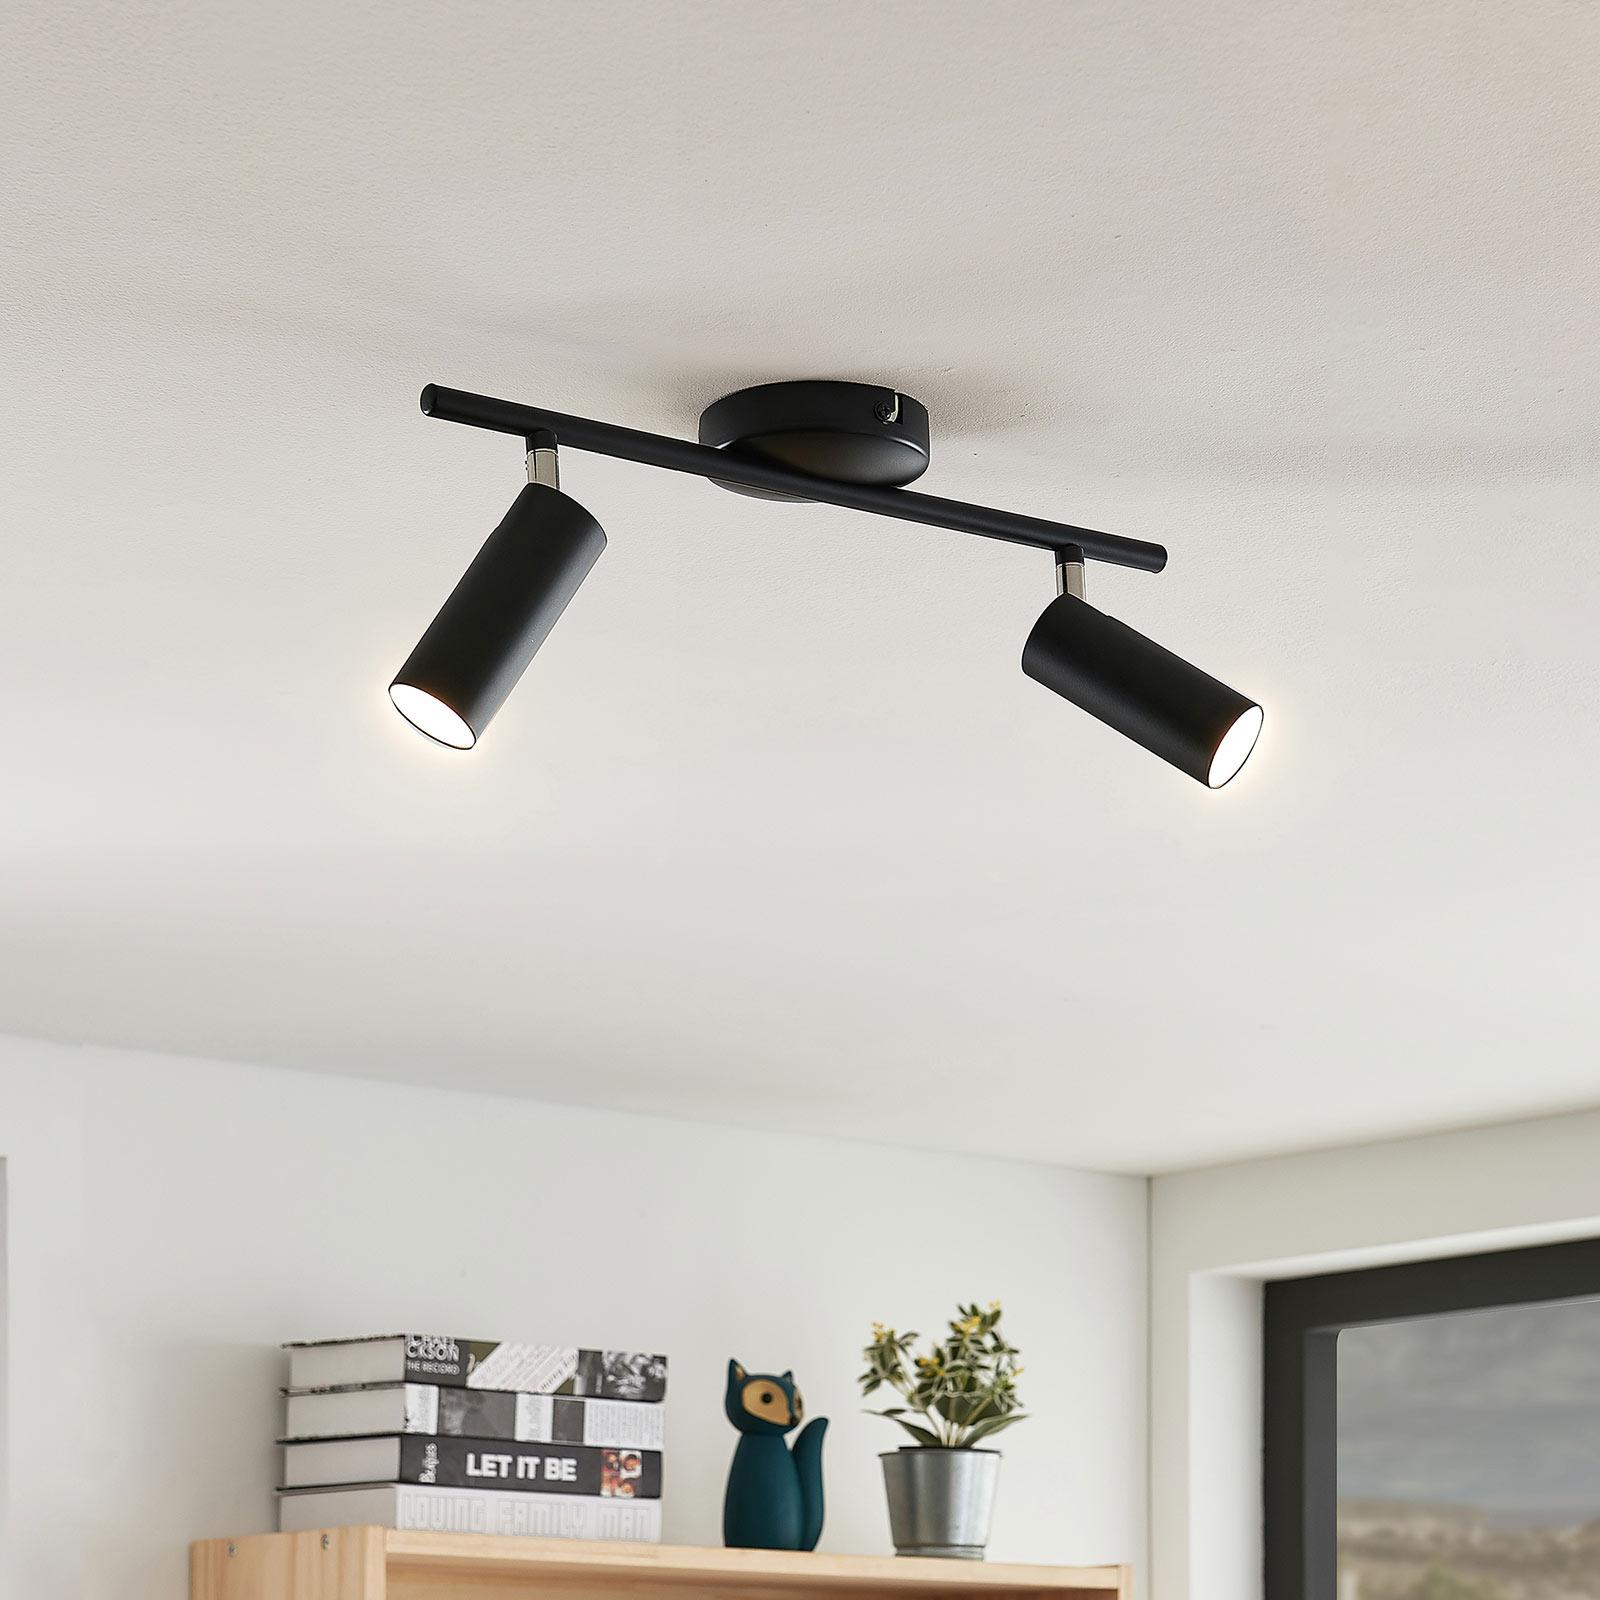 LED-takspot Camille, svart, 2 lyskilder